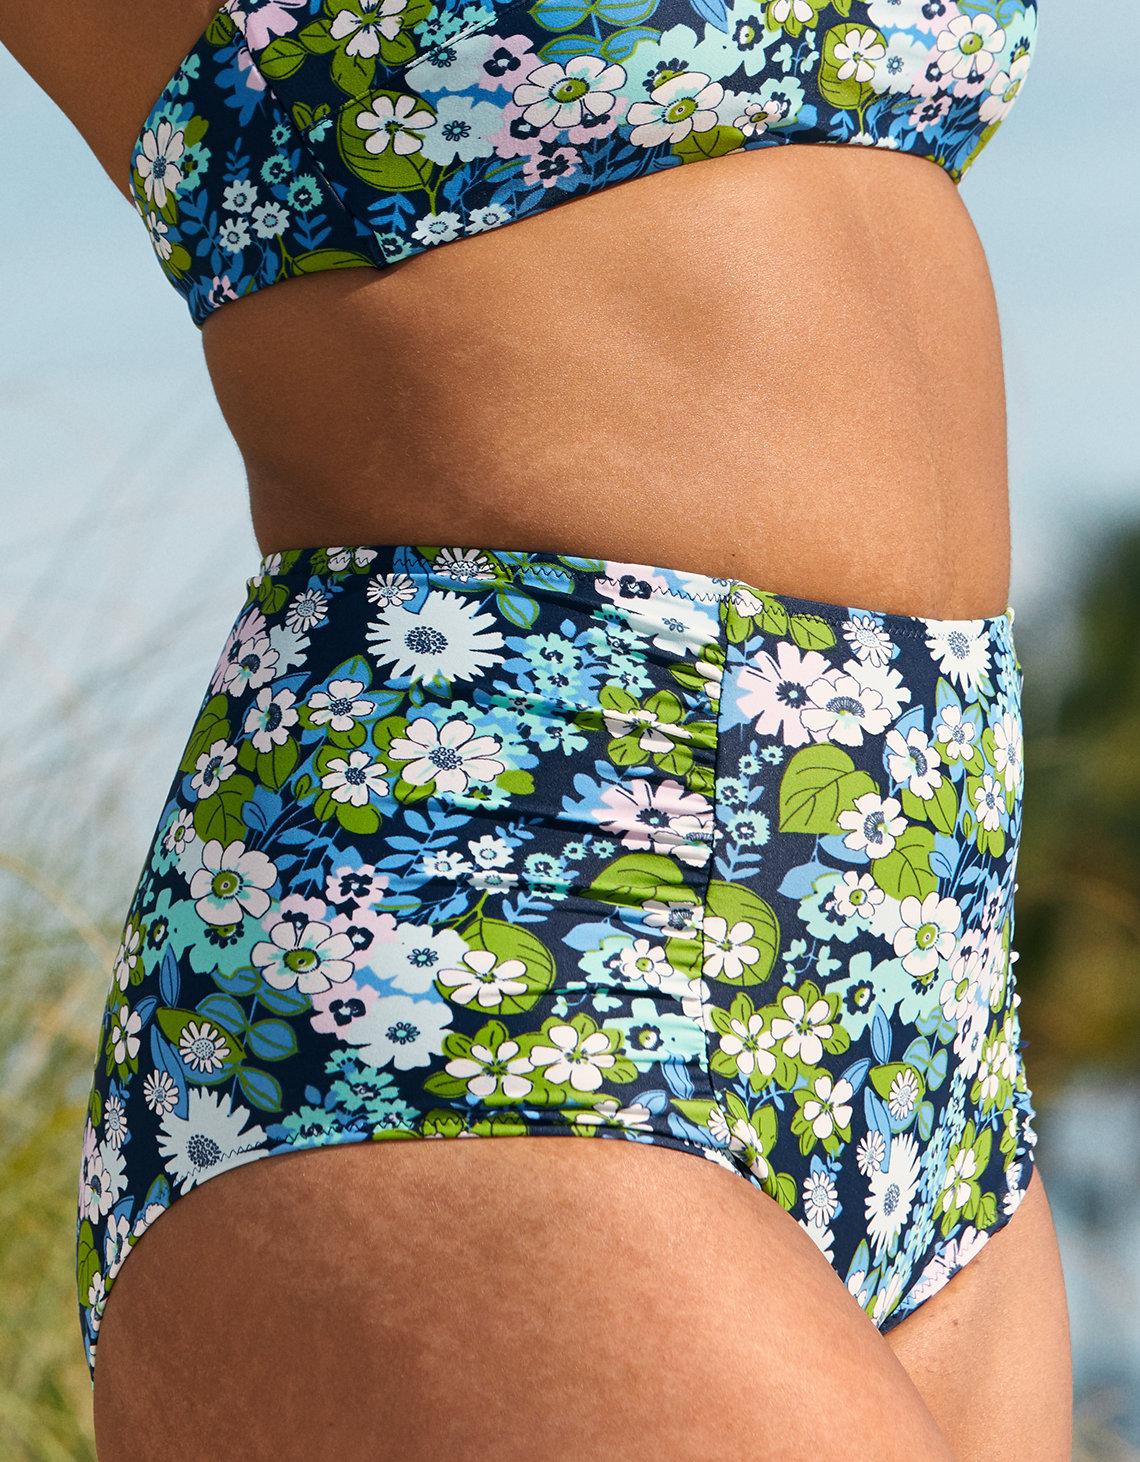 64212a9ead21c Aerie High Waisted Bikini Bottom, Monaco Blue   Aerie for American Eagle